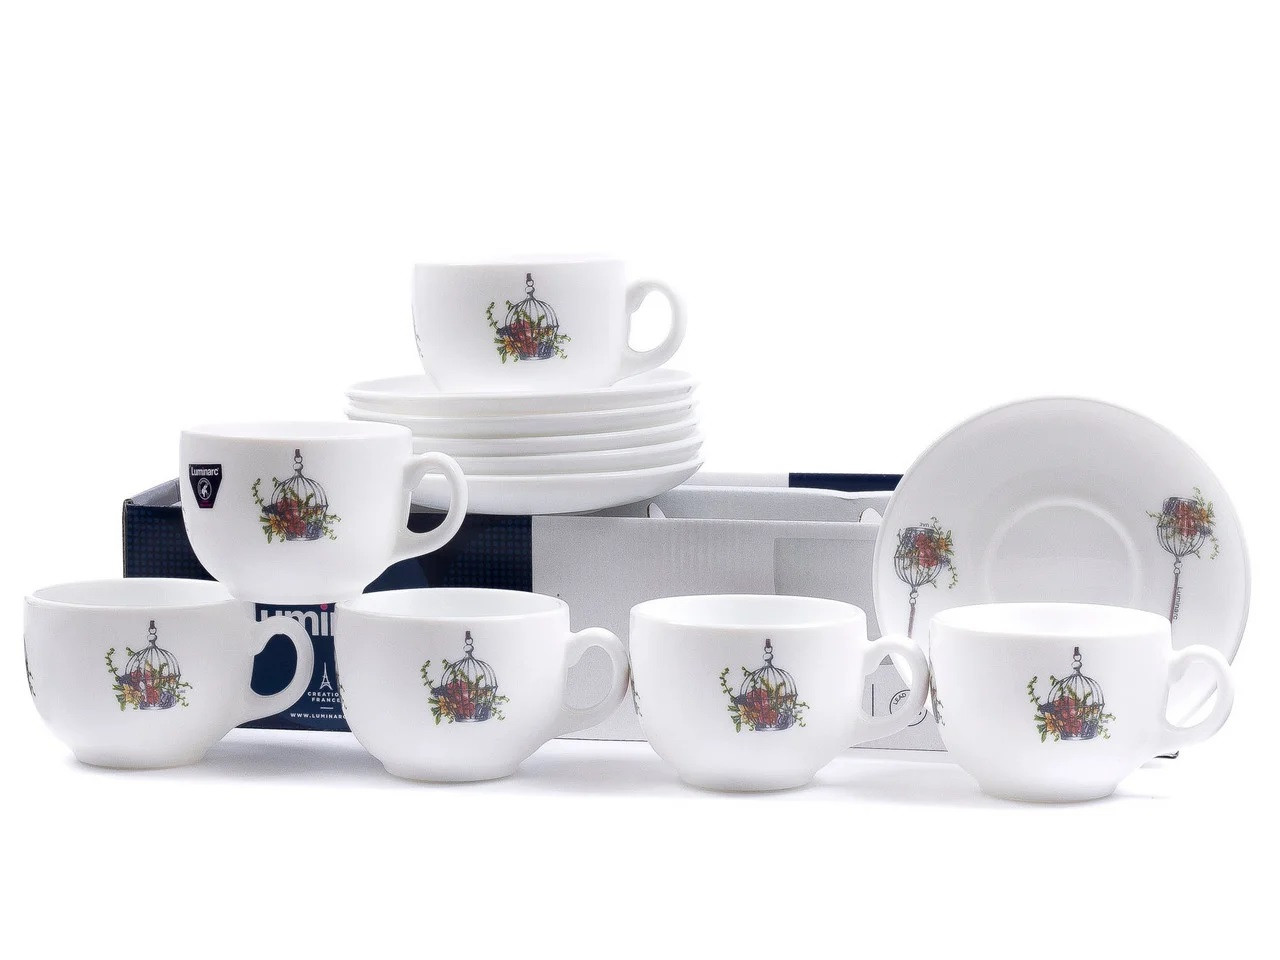 Чайный сервиз Luminarc Flore на 6 персон